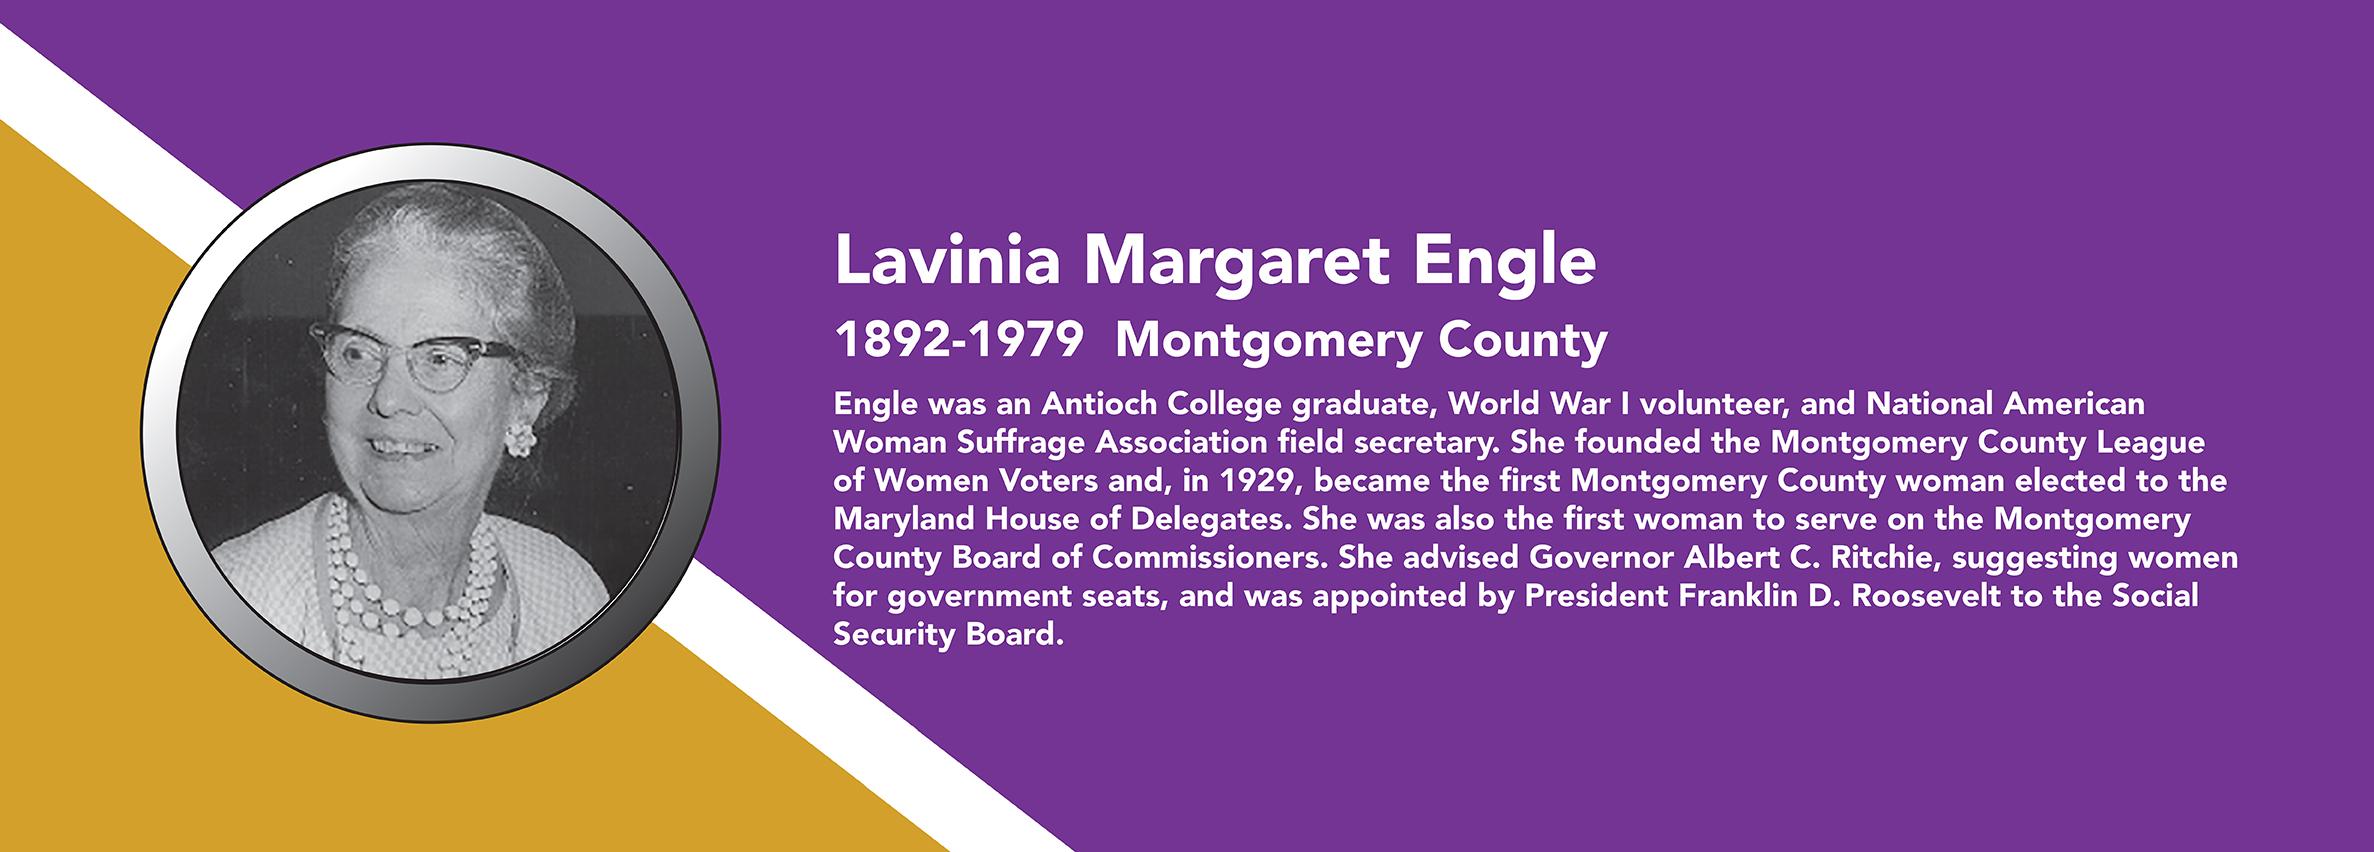 Lavinia Margaret Engle